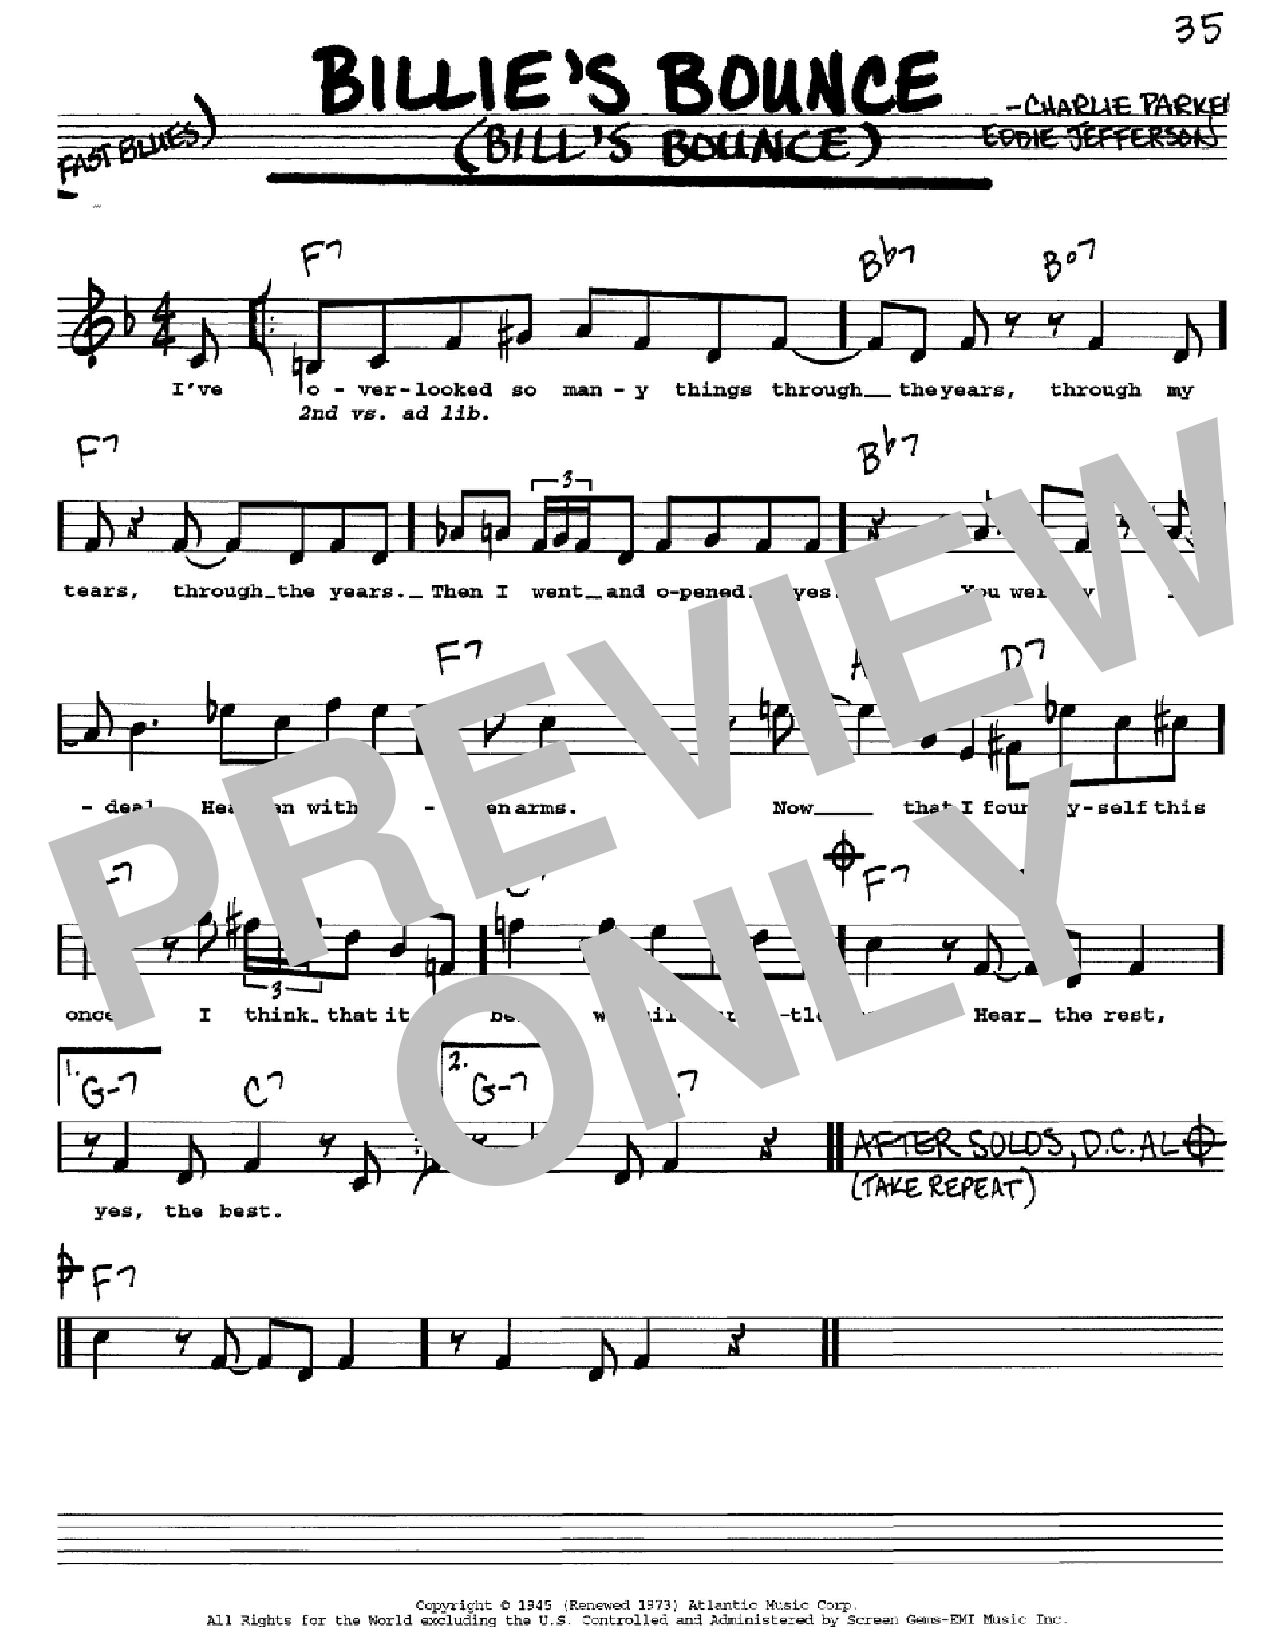 Billie's Bounce (Bill's Bounce) (Real Book – Melody, Lyrics & Chords)